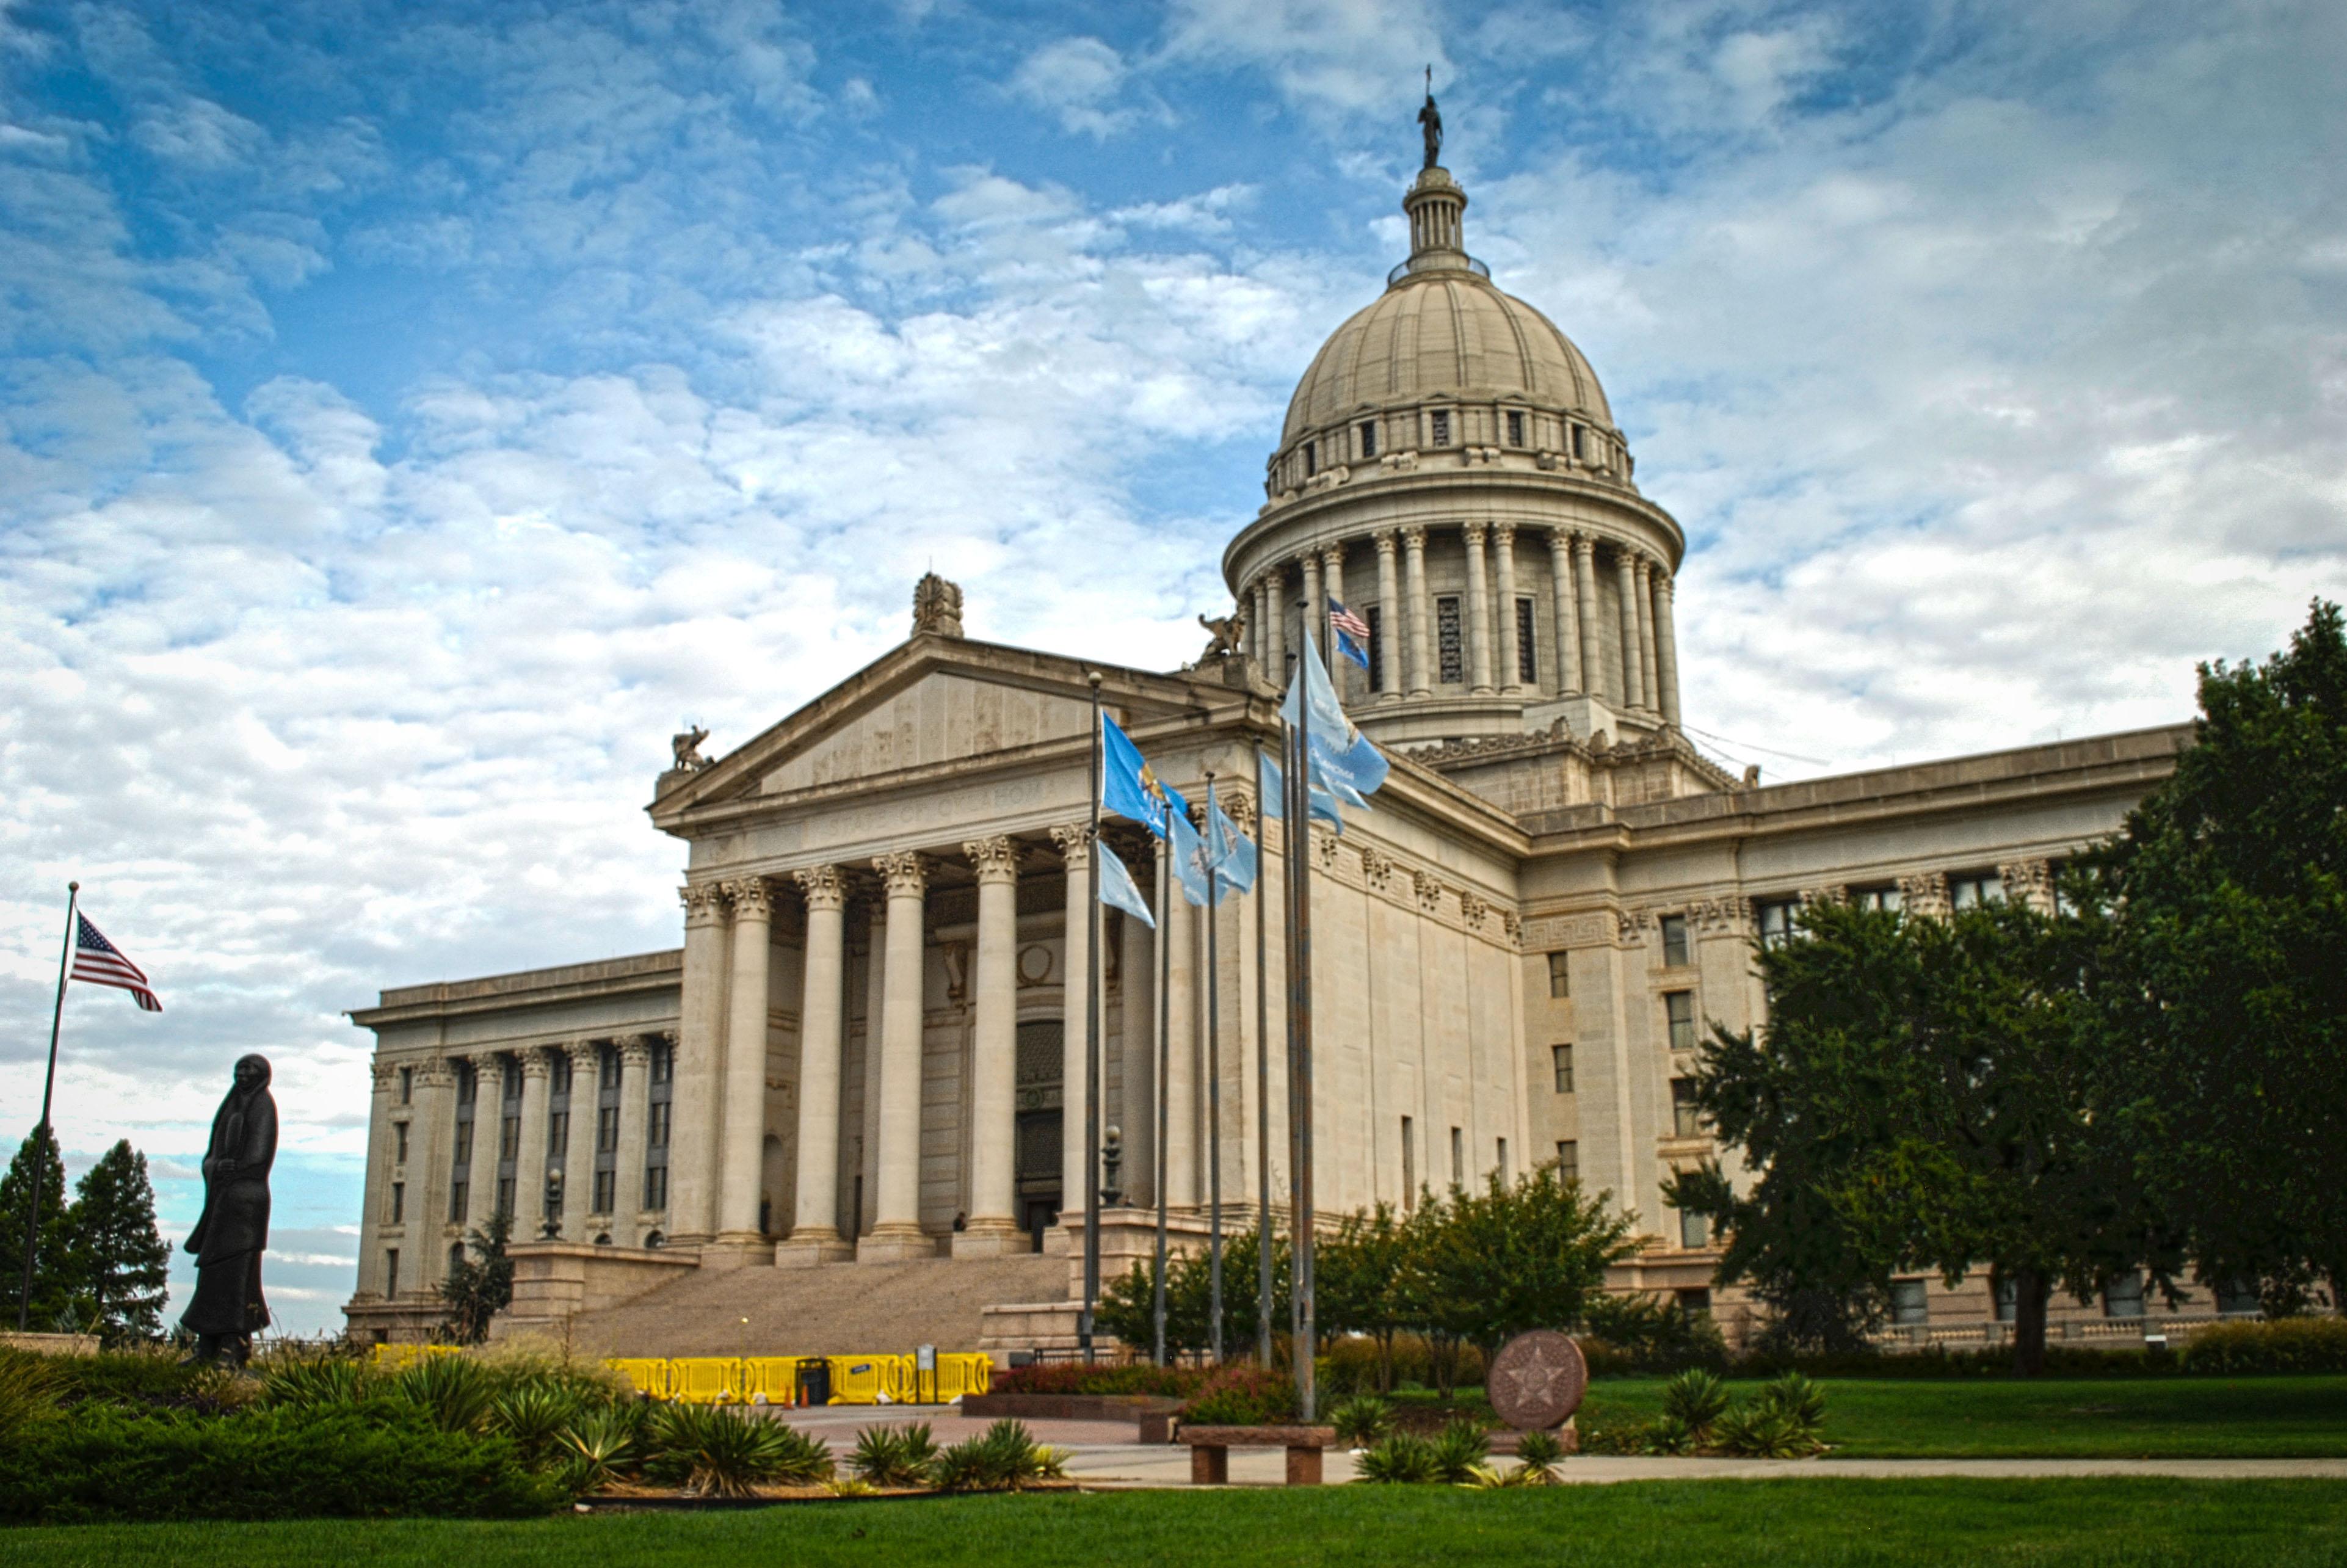 The Oklahoma Capitol building.